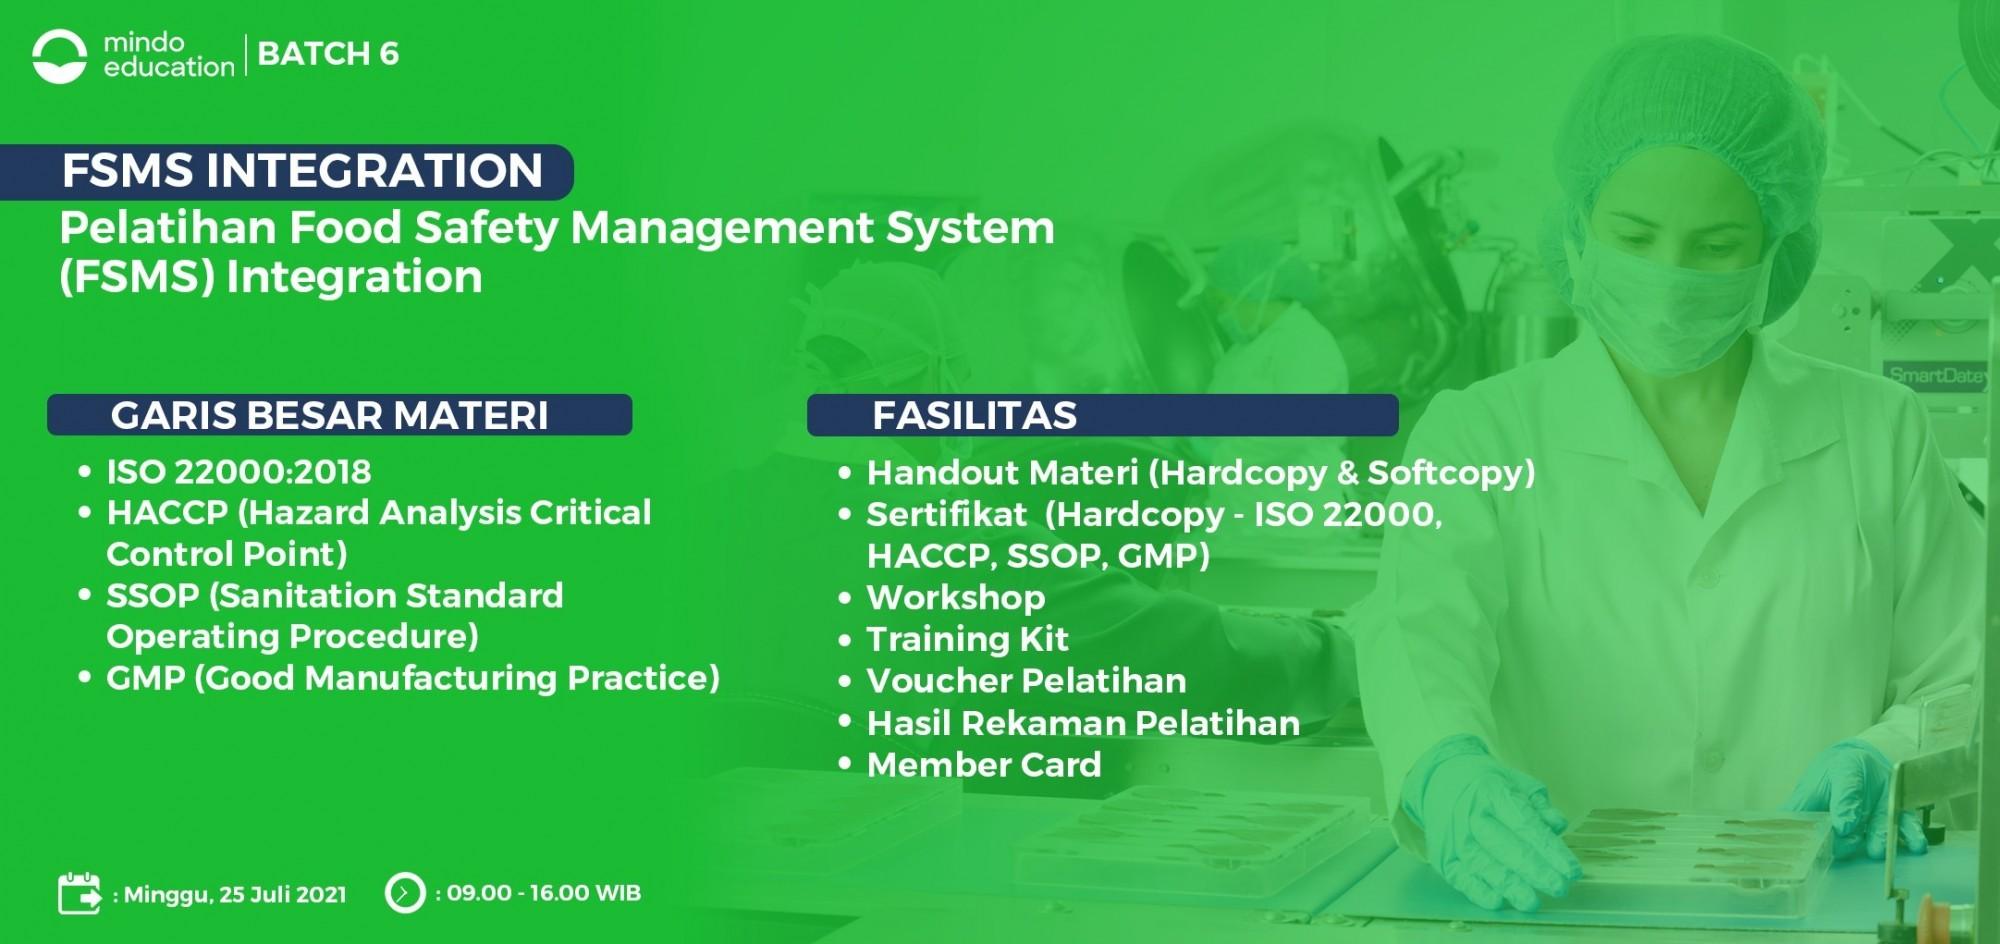 Pelatihan Food Safety Management System (FSMS) Integration